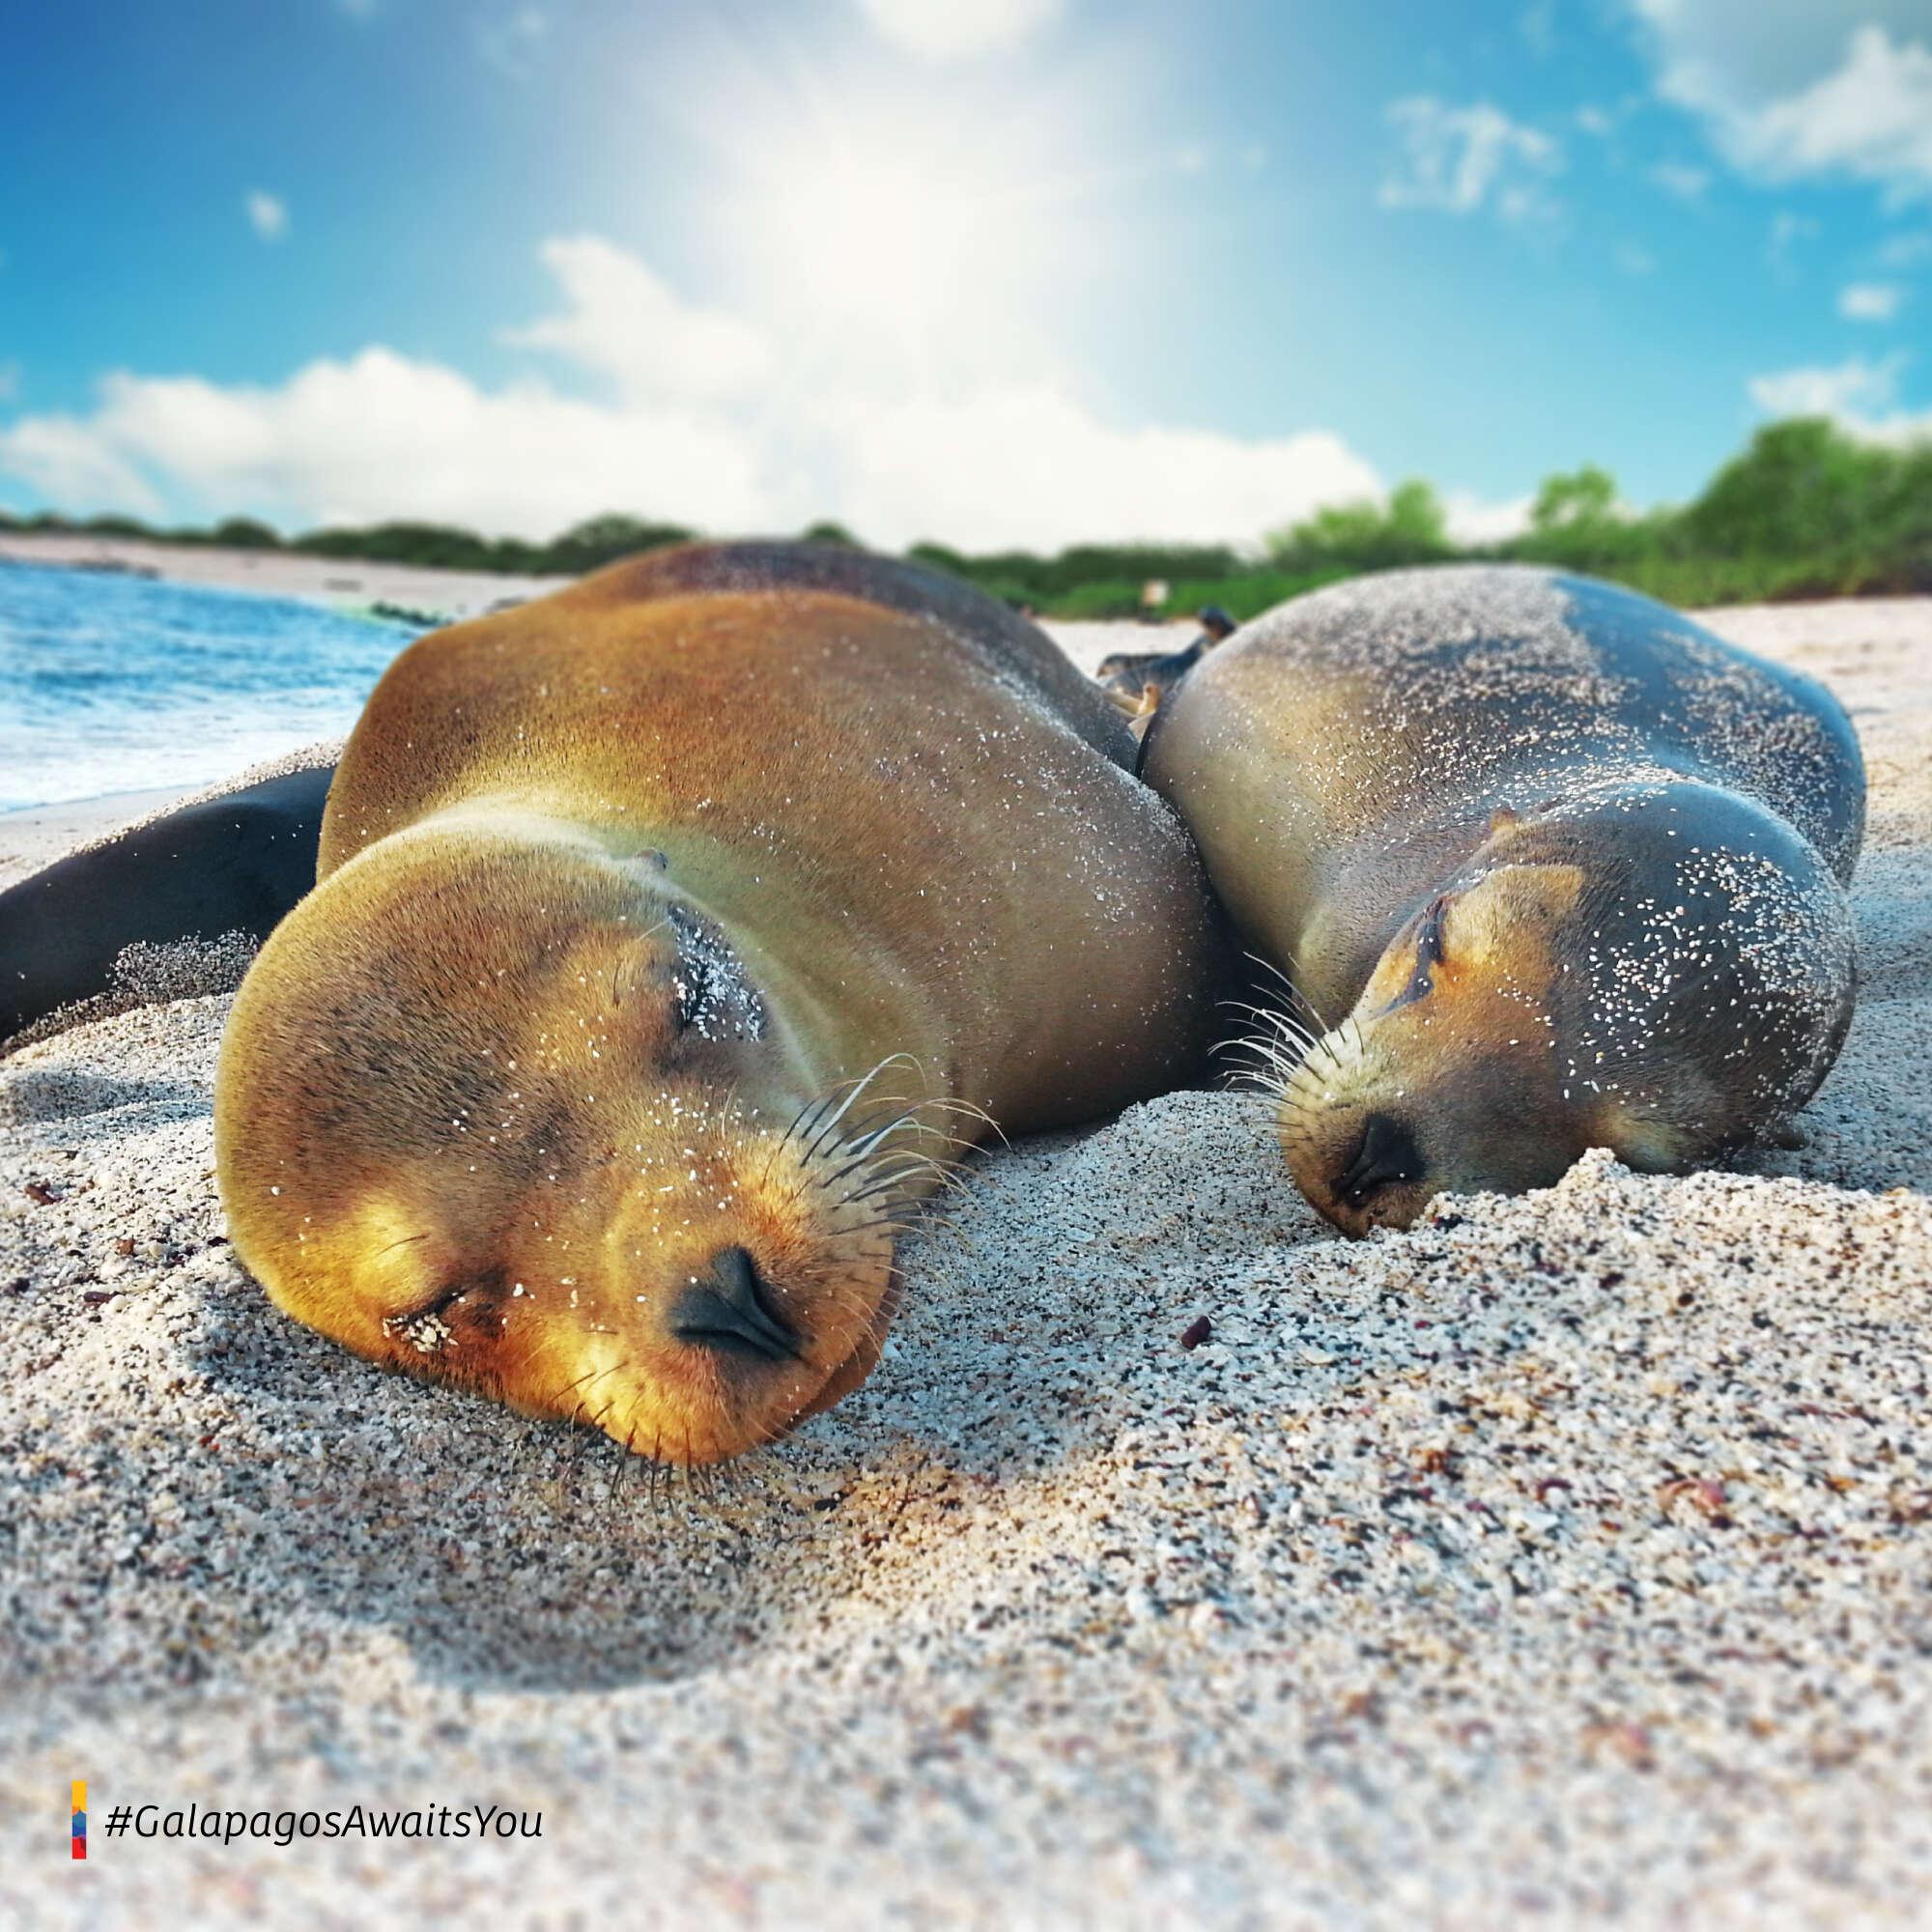 April 20 / San Cristobal Island – Hotel Blue Marlin